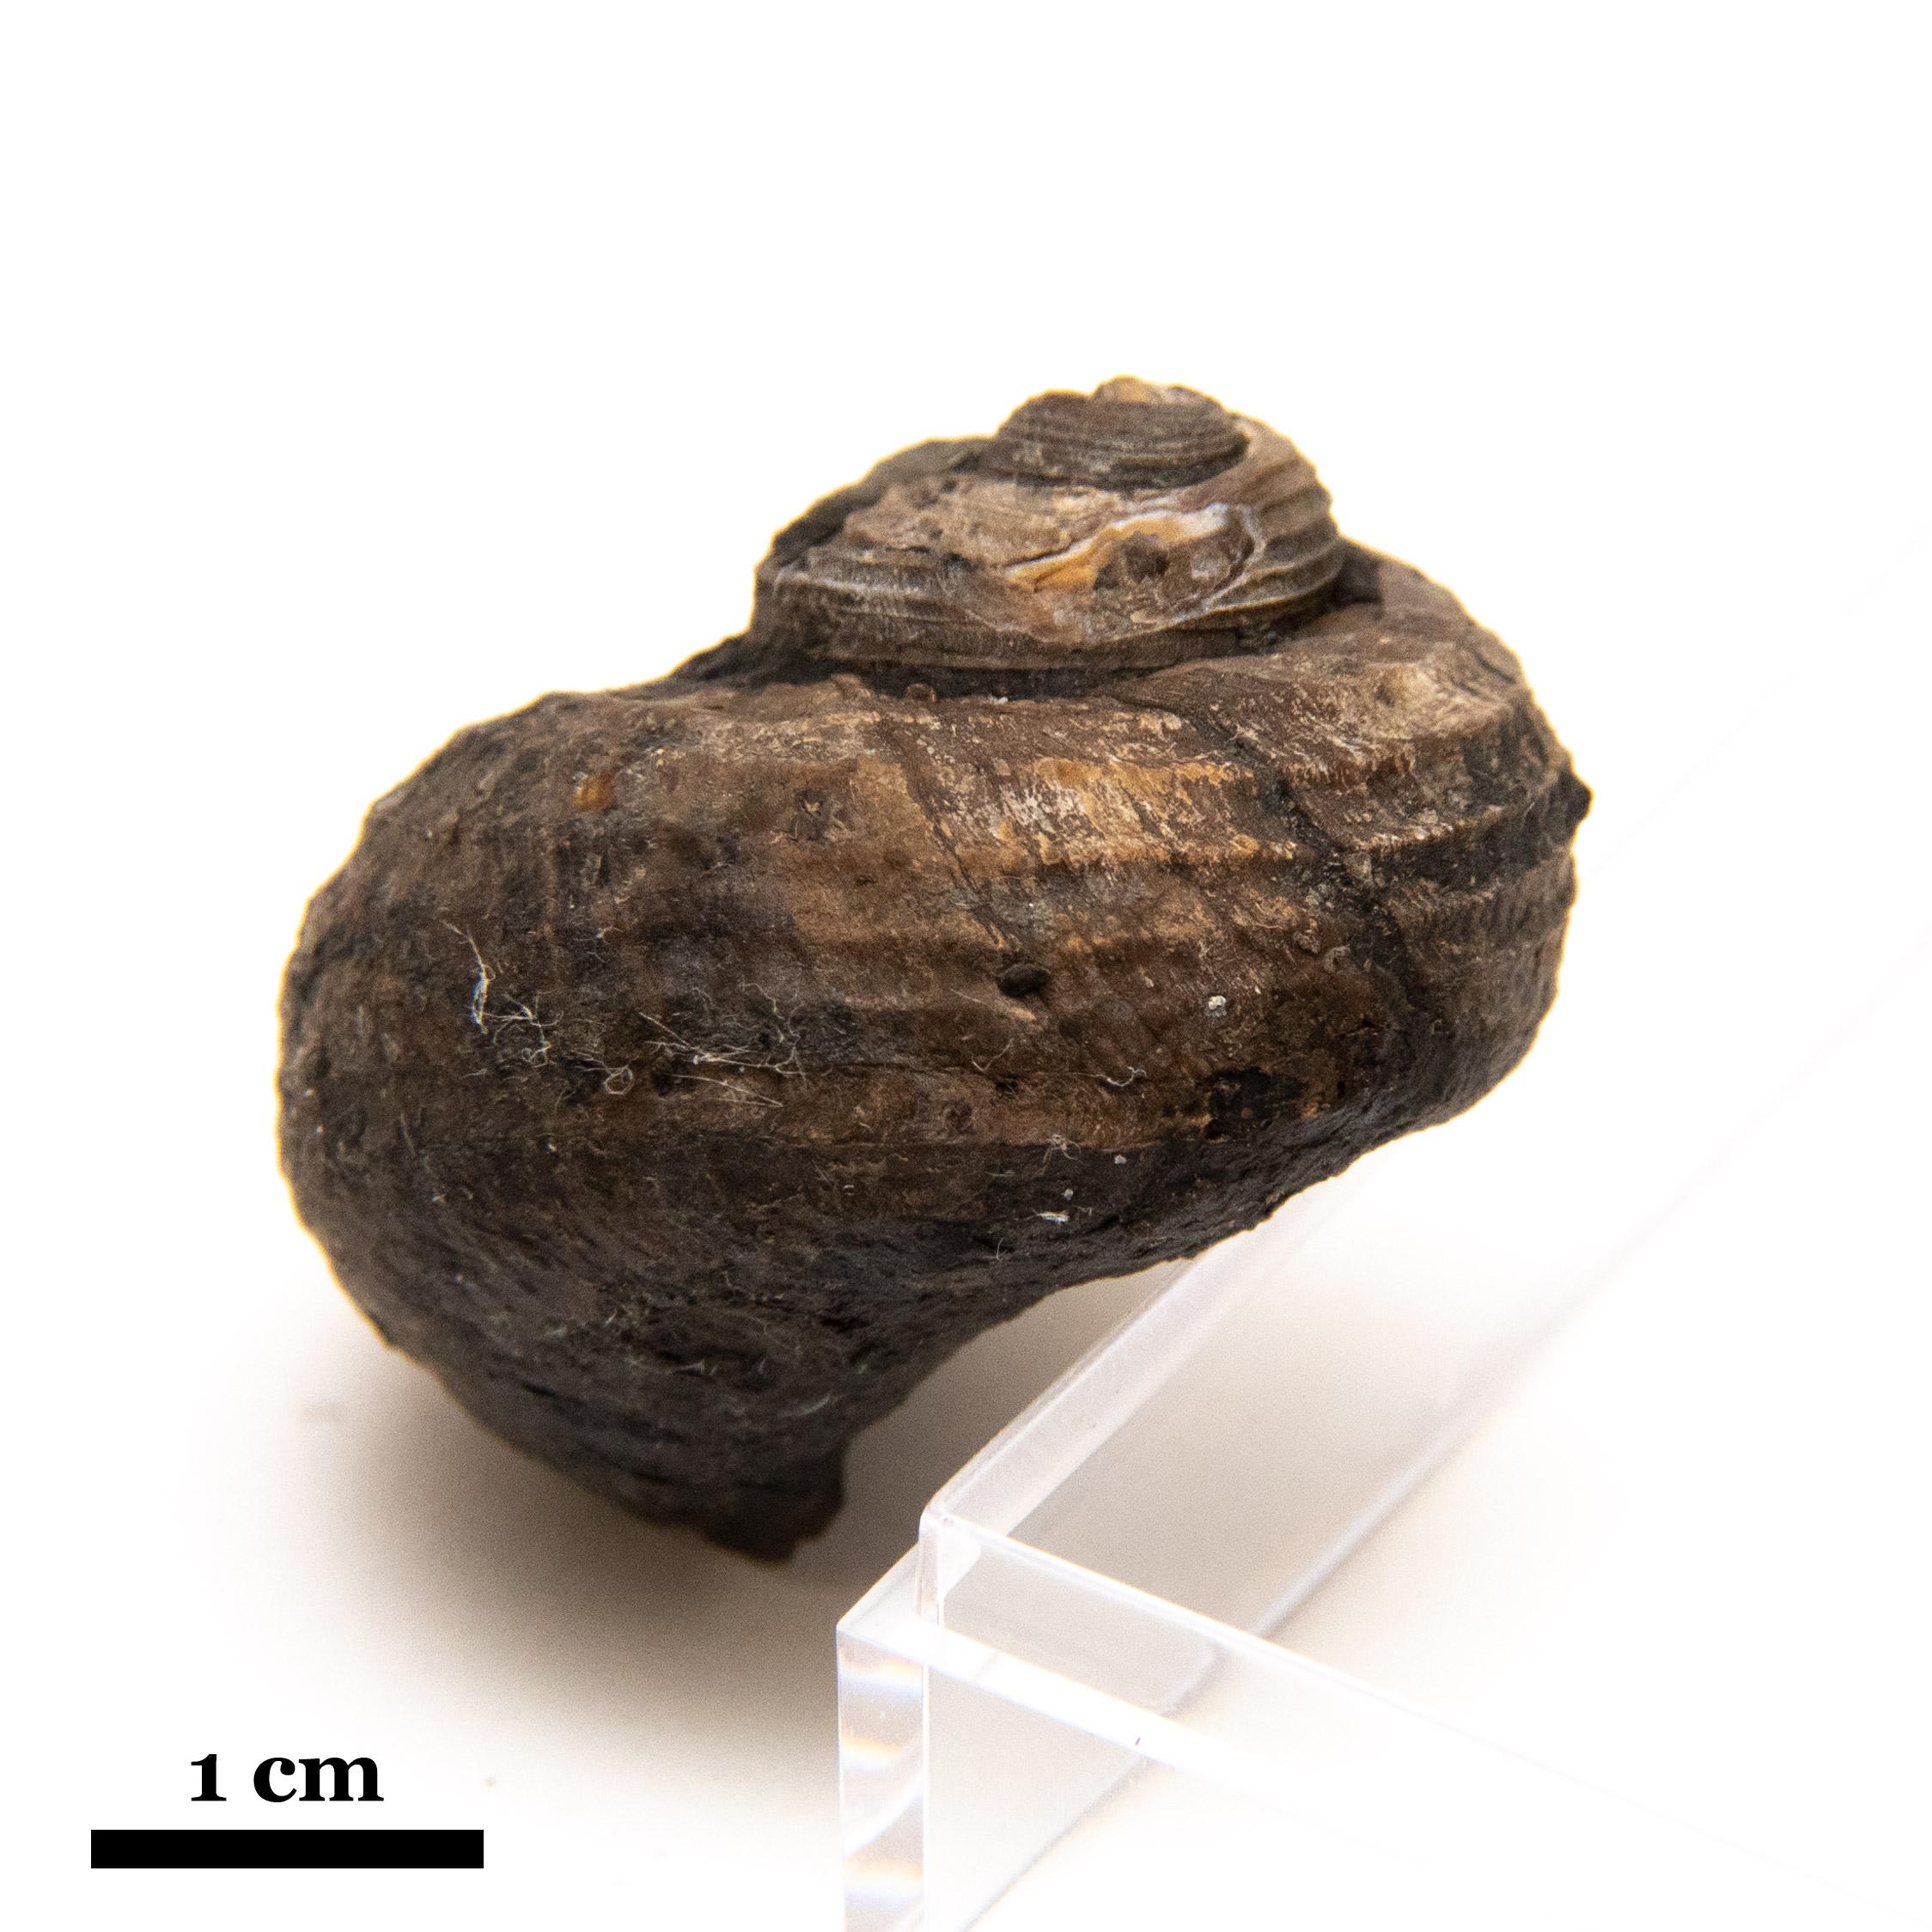 Shansiella carbonaria